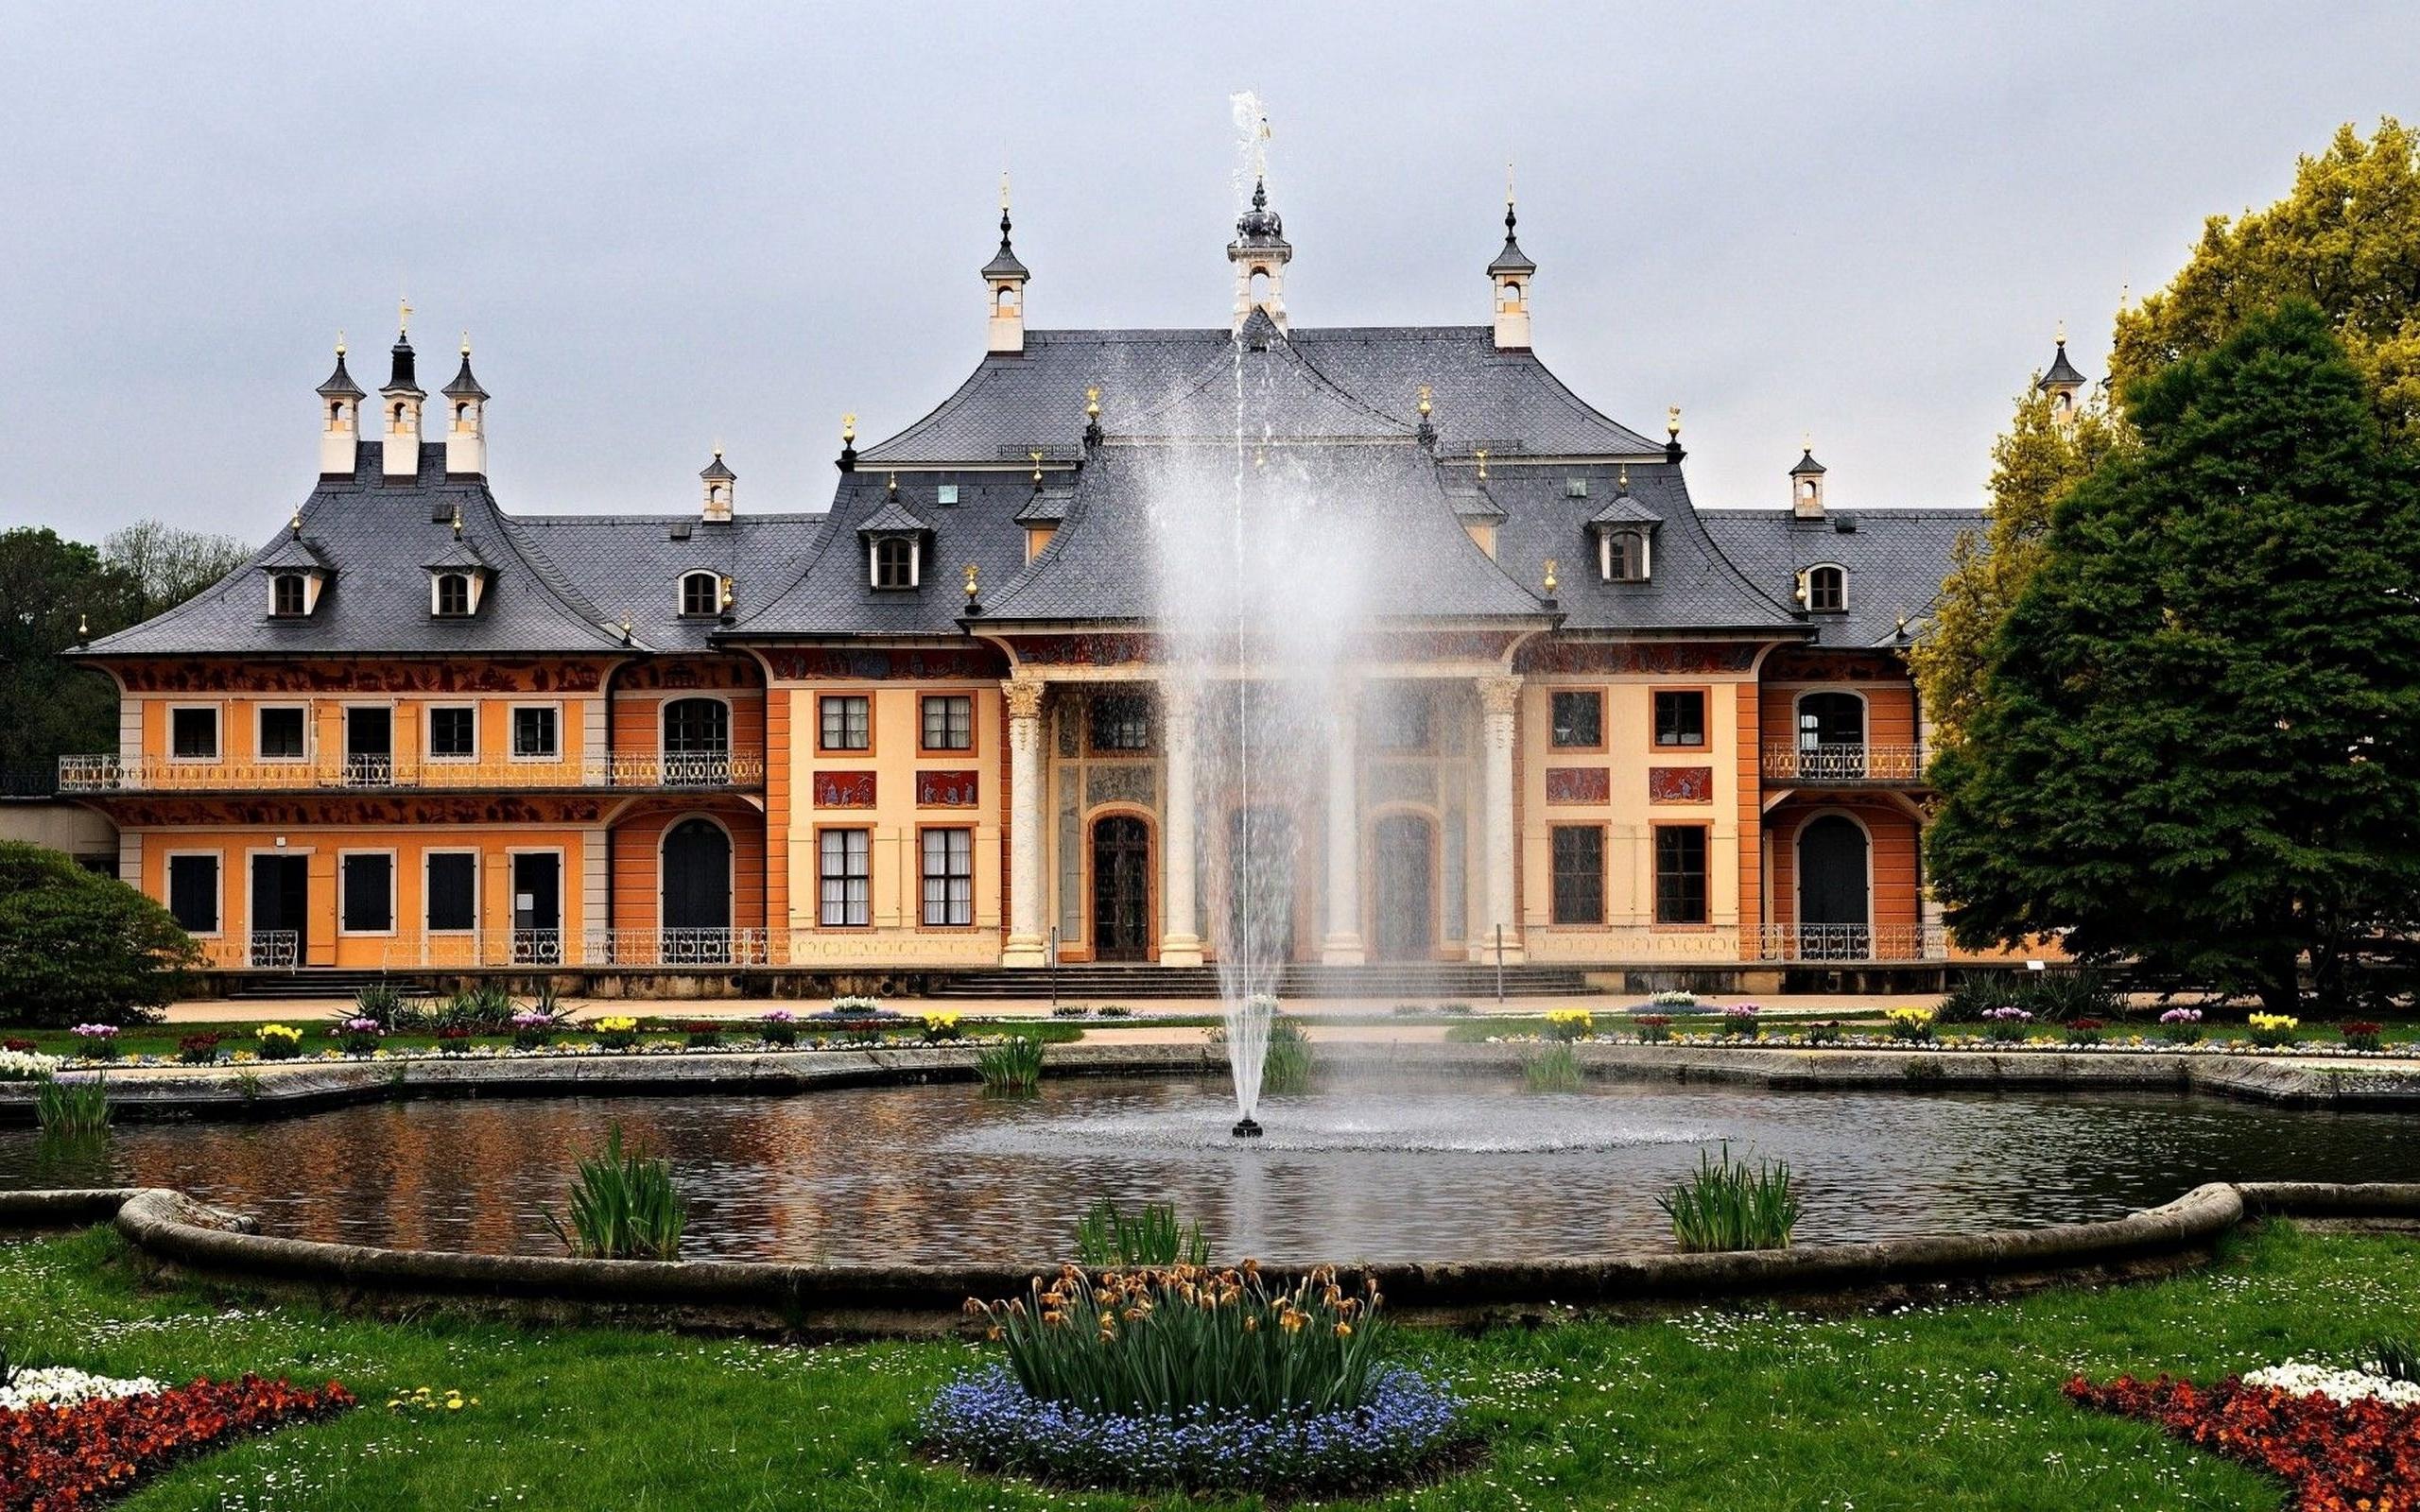 германия, дрезден, замок pillnitz, фонтан